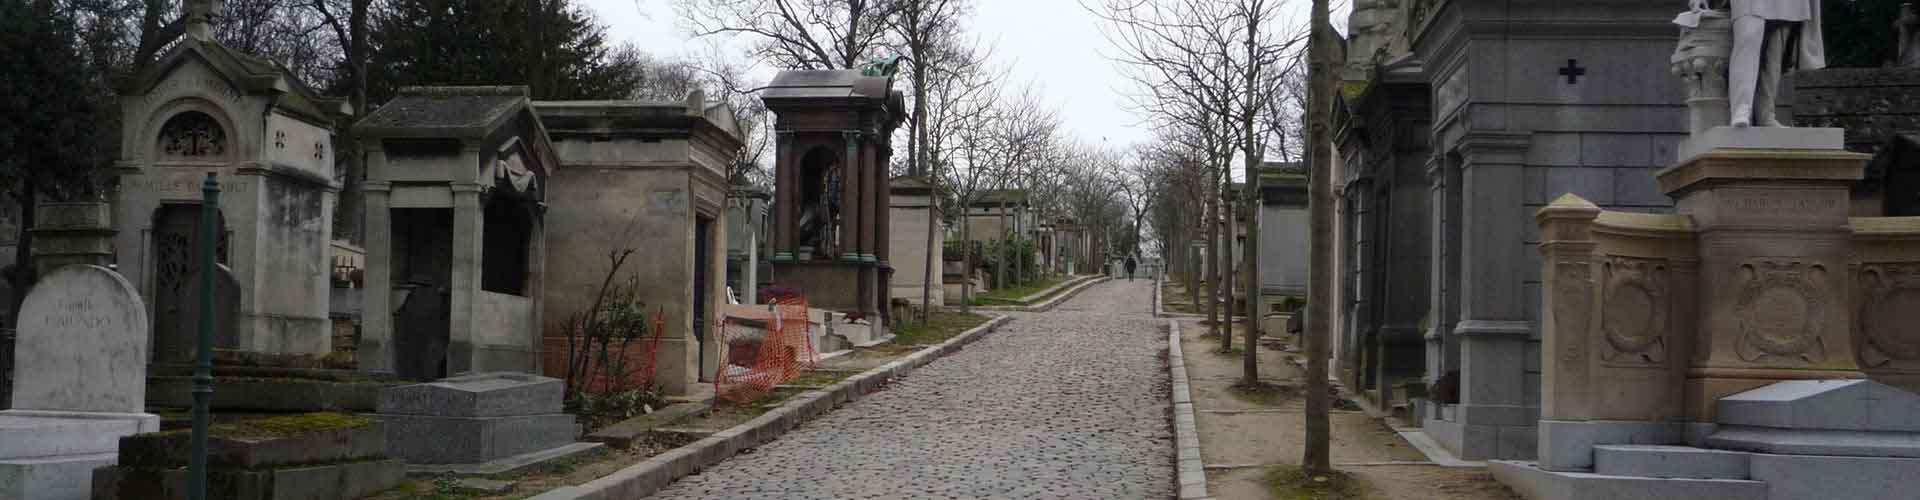 París - Hostales cerca a Cementerio de Père Lachaise. Mapas de París, Fotos y comentarios de cada Hostal en París.